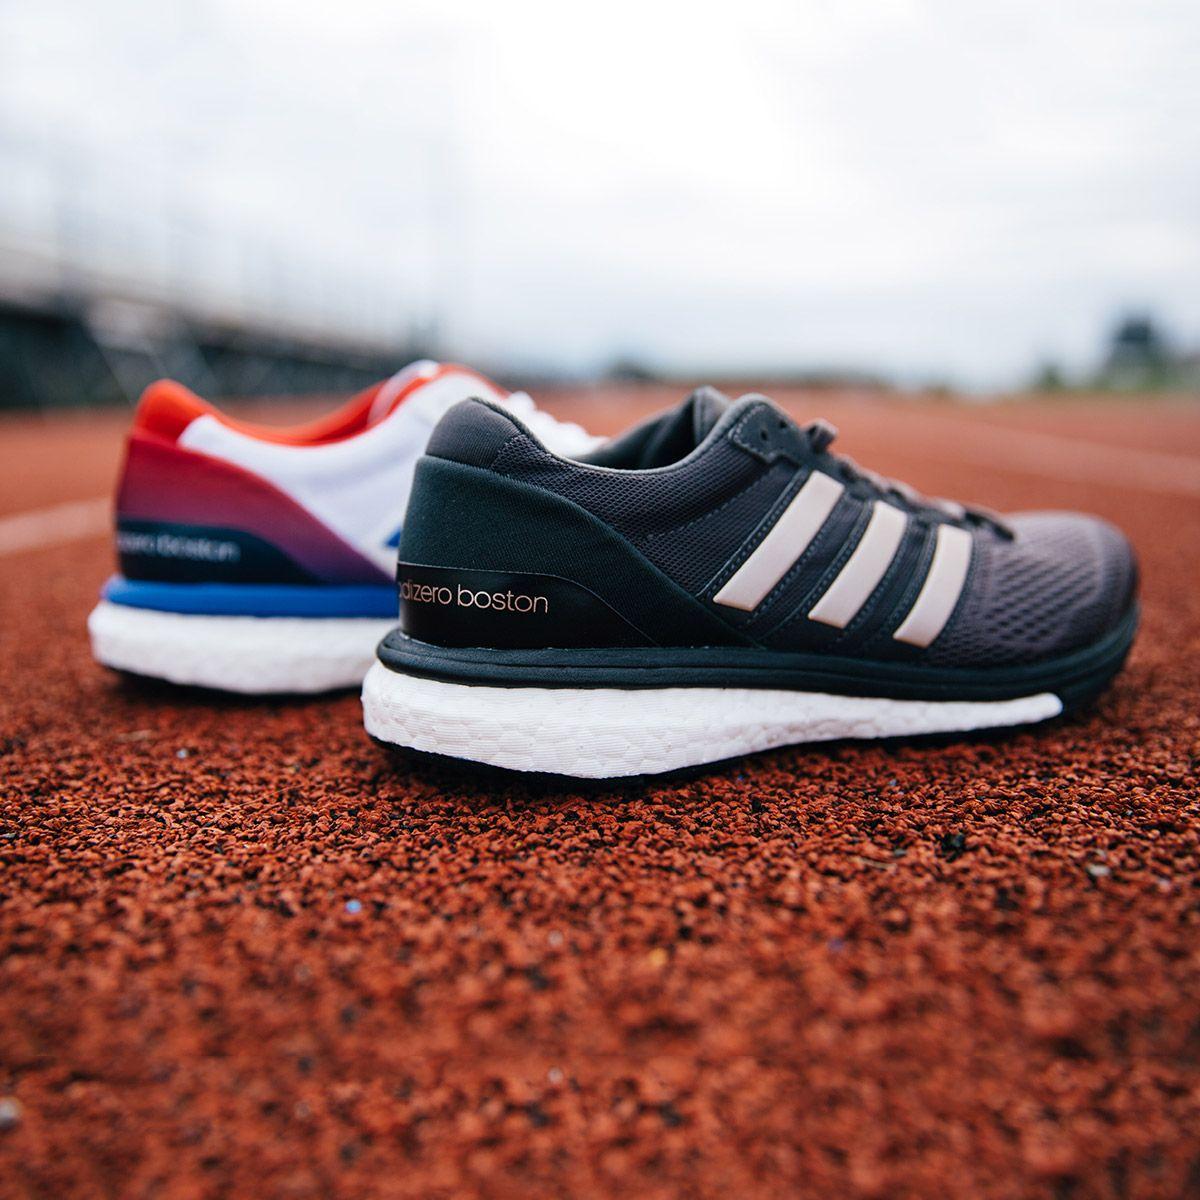 uk availability 82c8d 6a270 Fall 2017 Running Shoe Guide - adidas adizero Boston 6